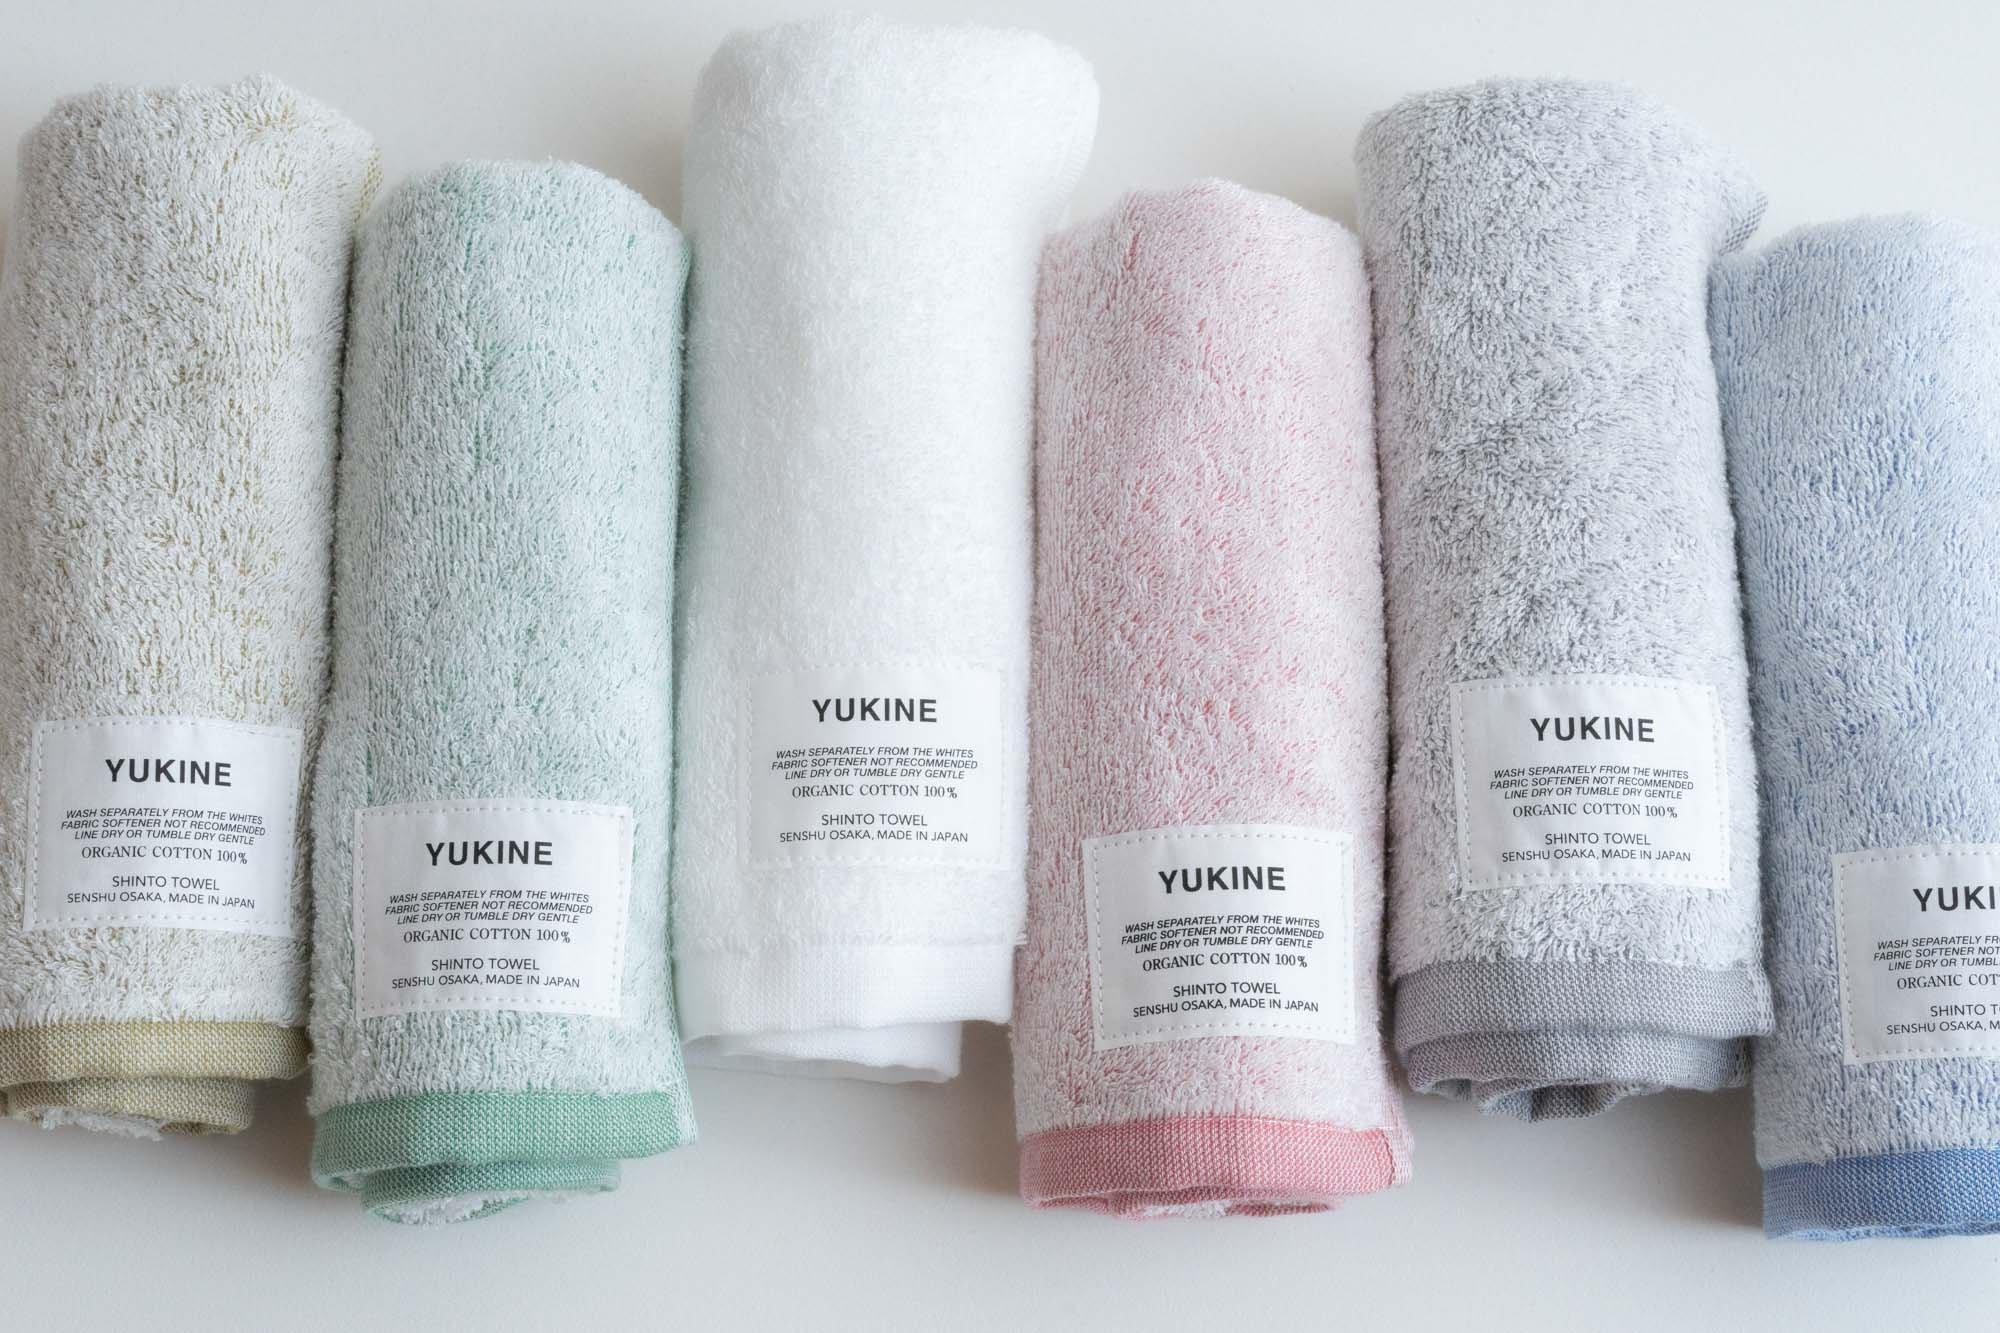 YUKINE FACE TOWEL